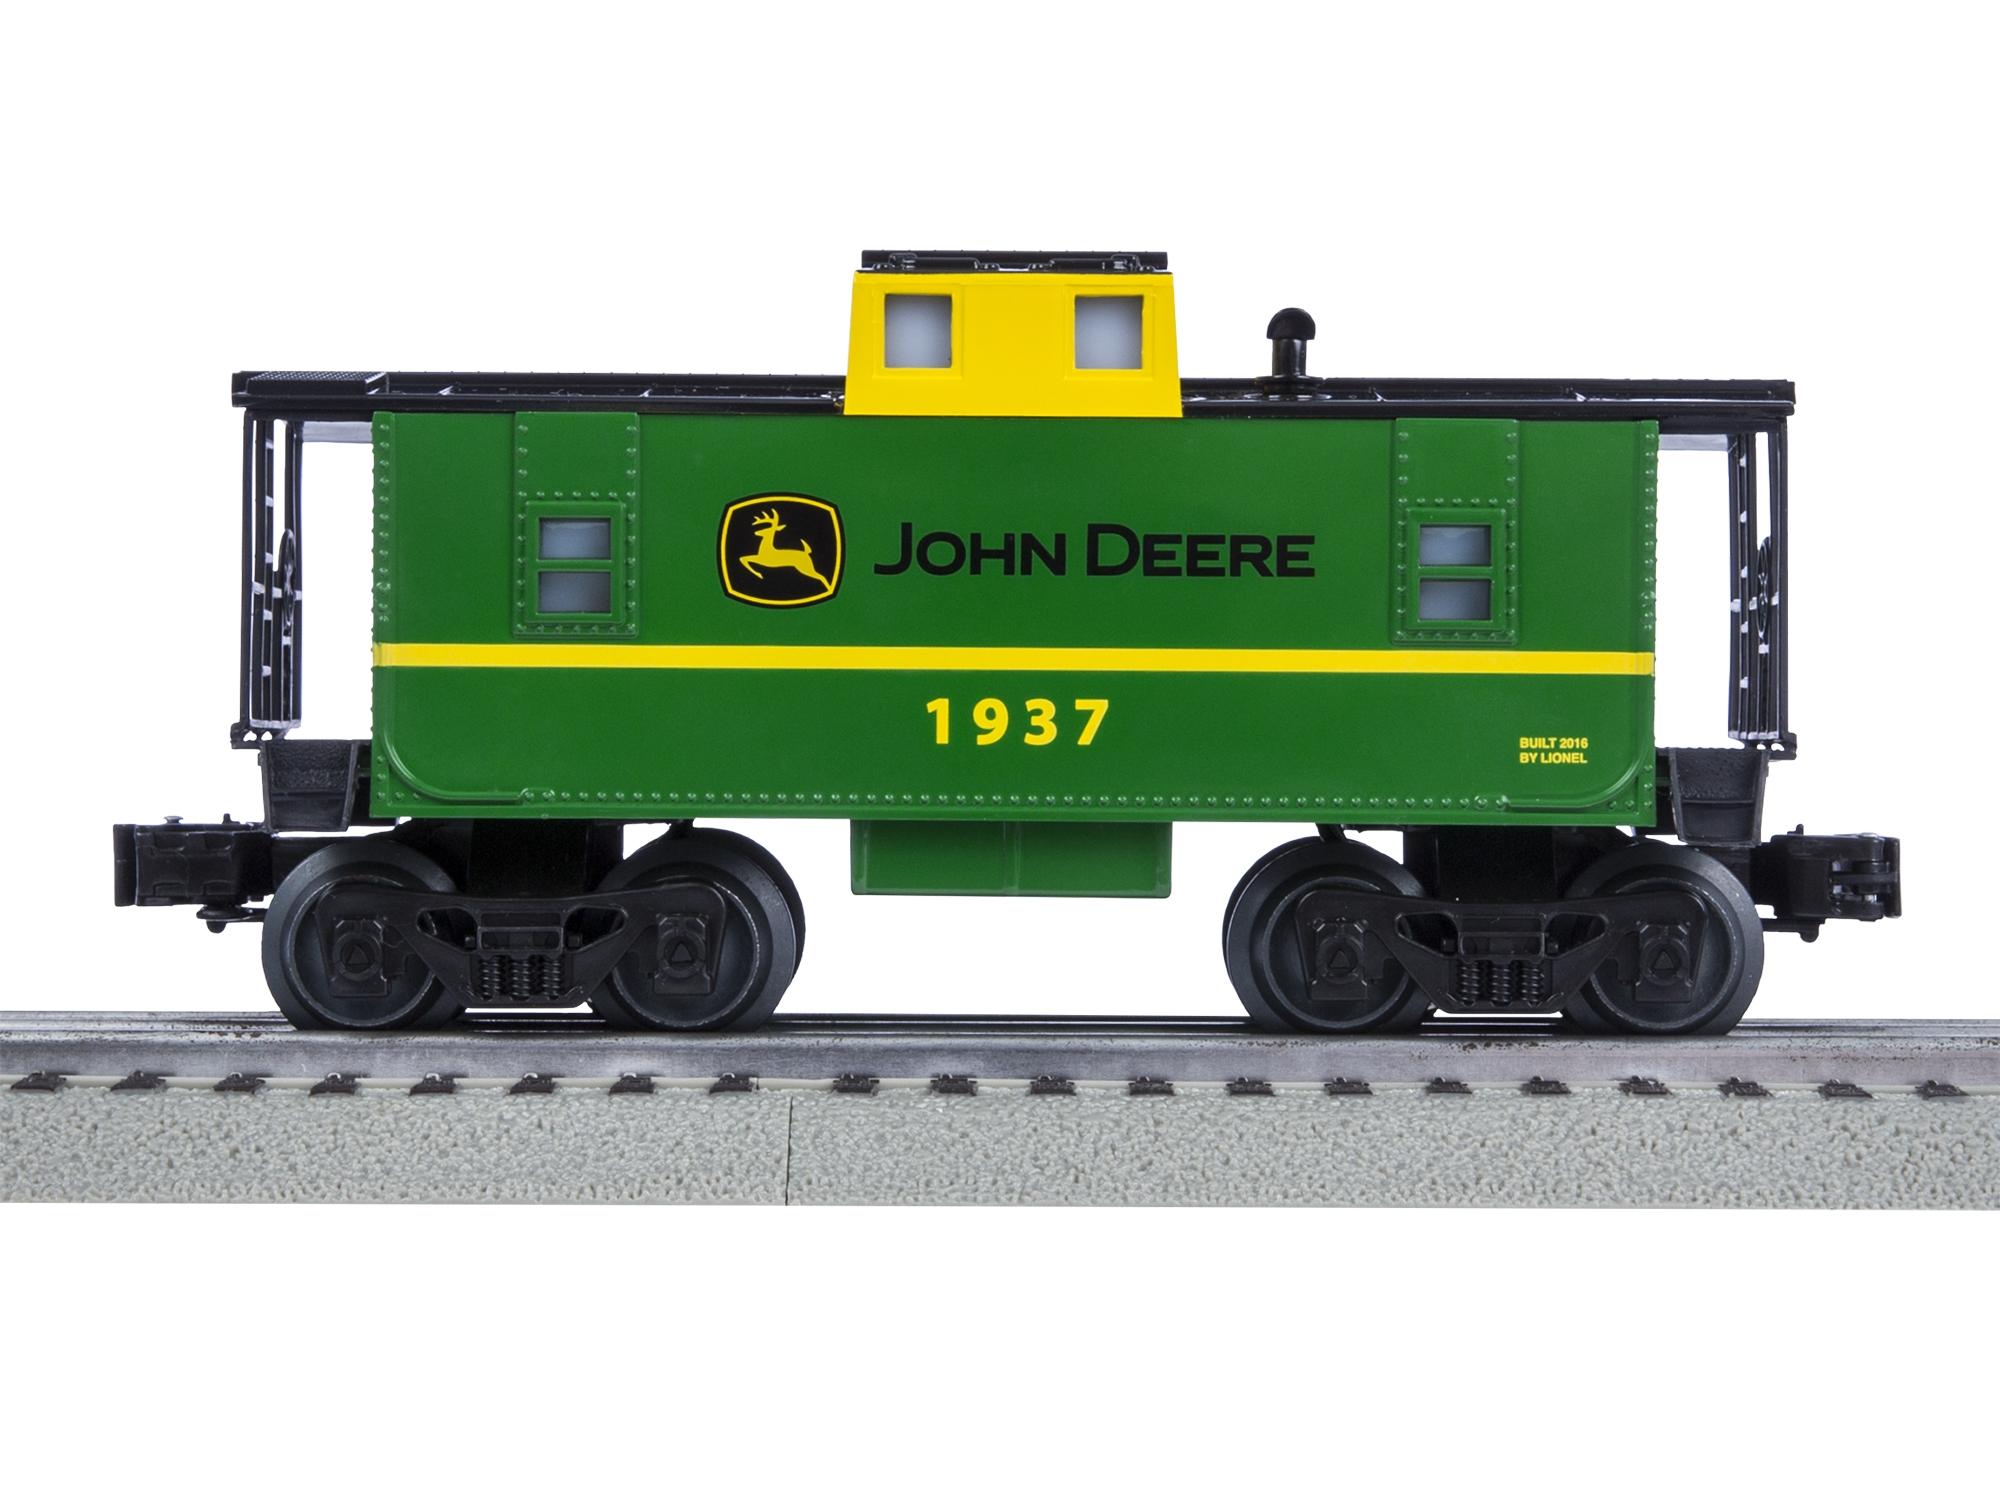 LIONEL JOHN DEERE STEAM LIONCHIEF REMOTE CONTROL TRAIN SET o gauge 6-83286 NEW